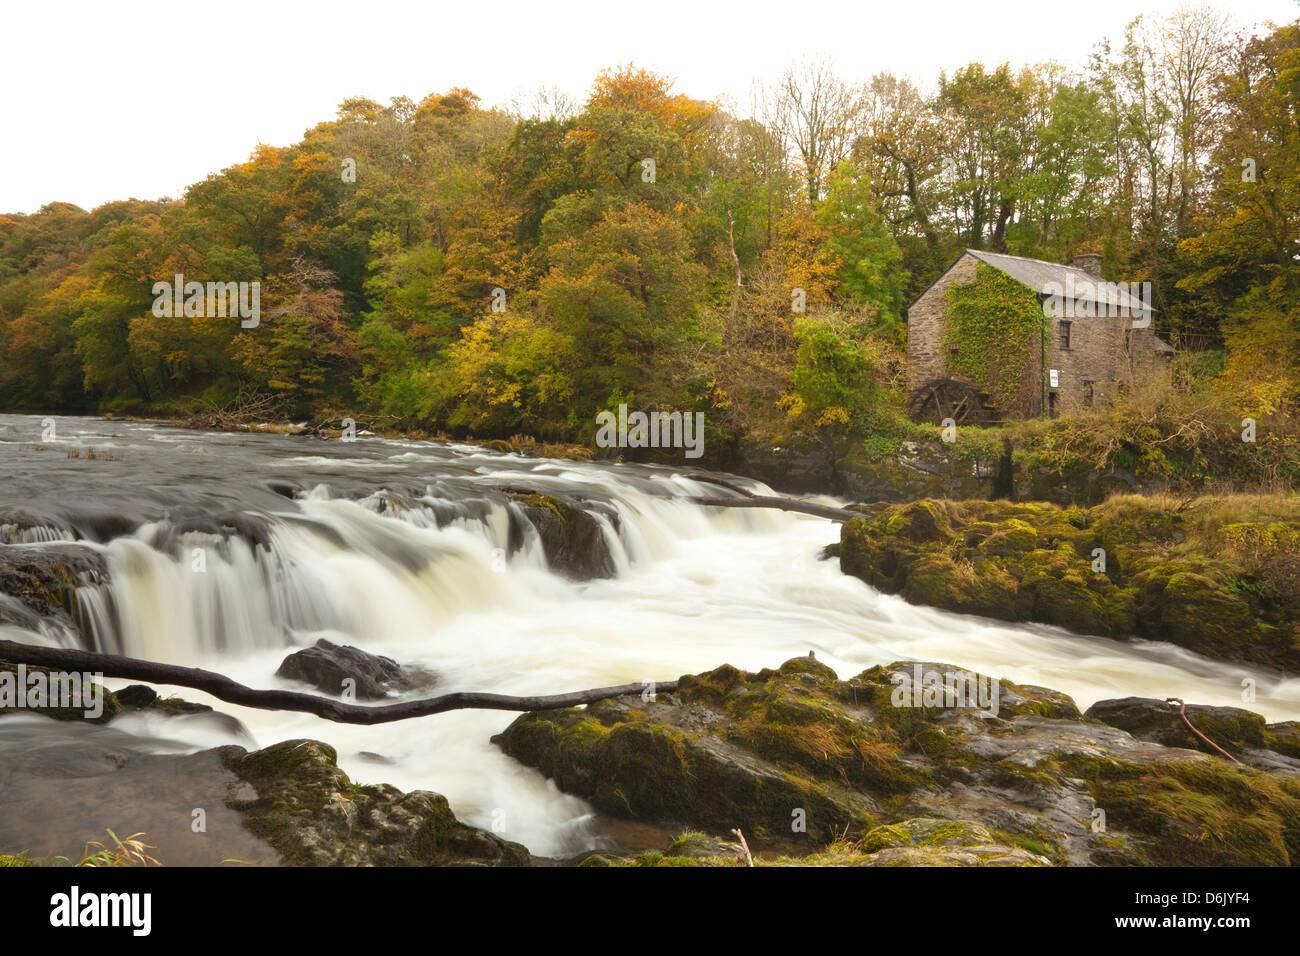 Cenarth Waterfalls, Carmarthenshire, Wales, United Kingdom, Europe - Stock Image